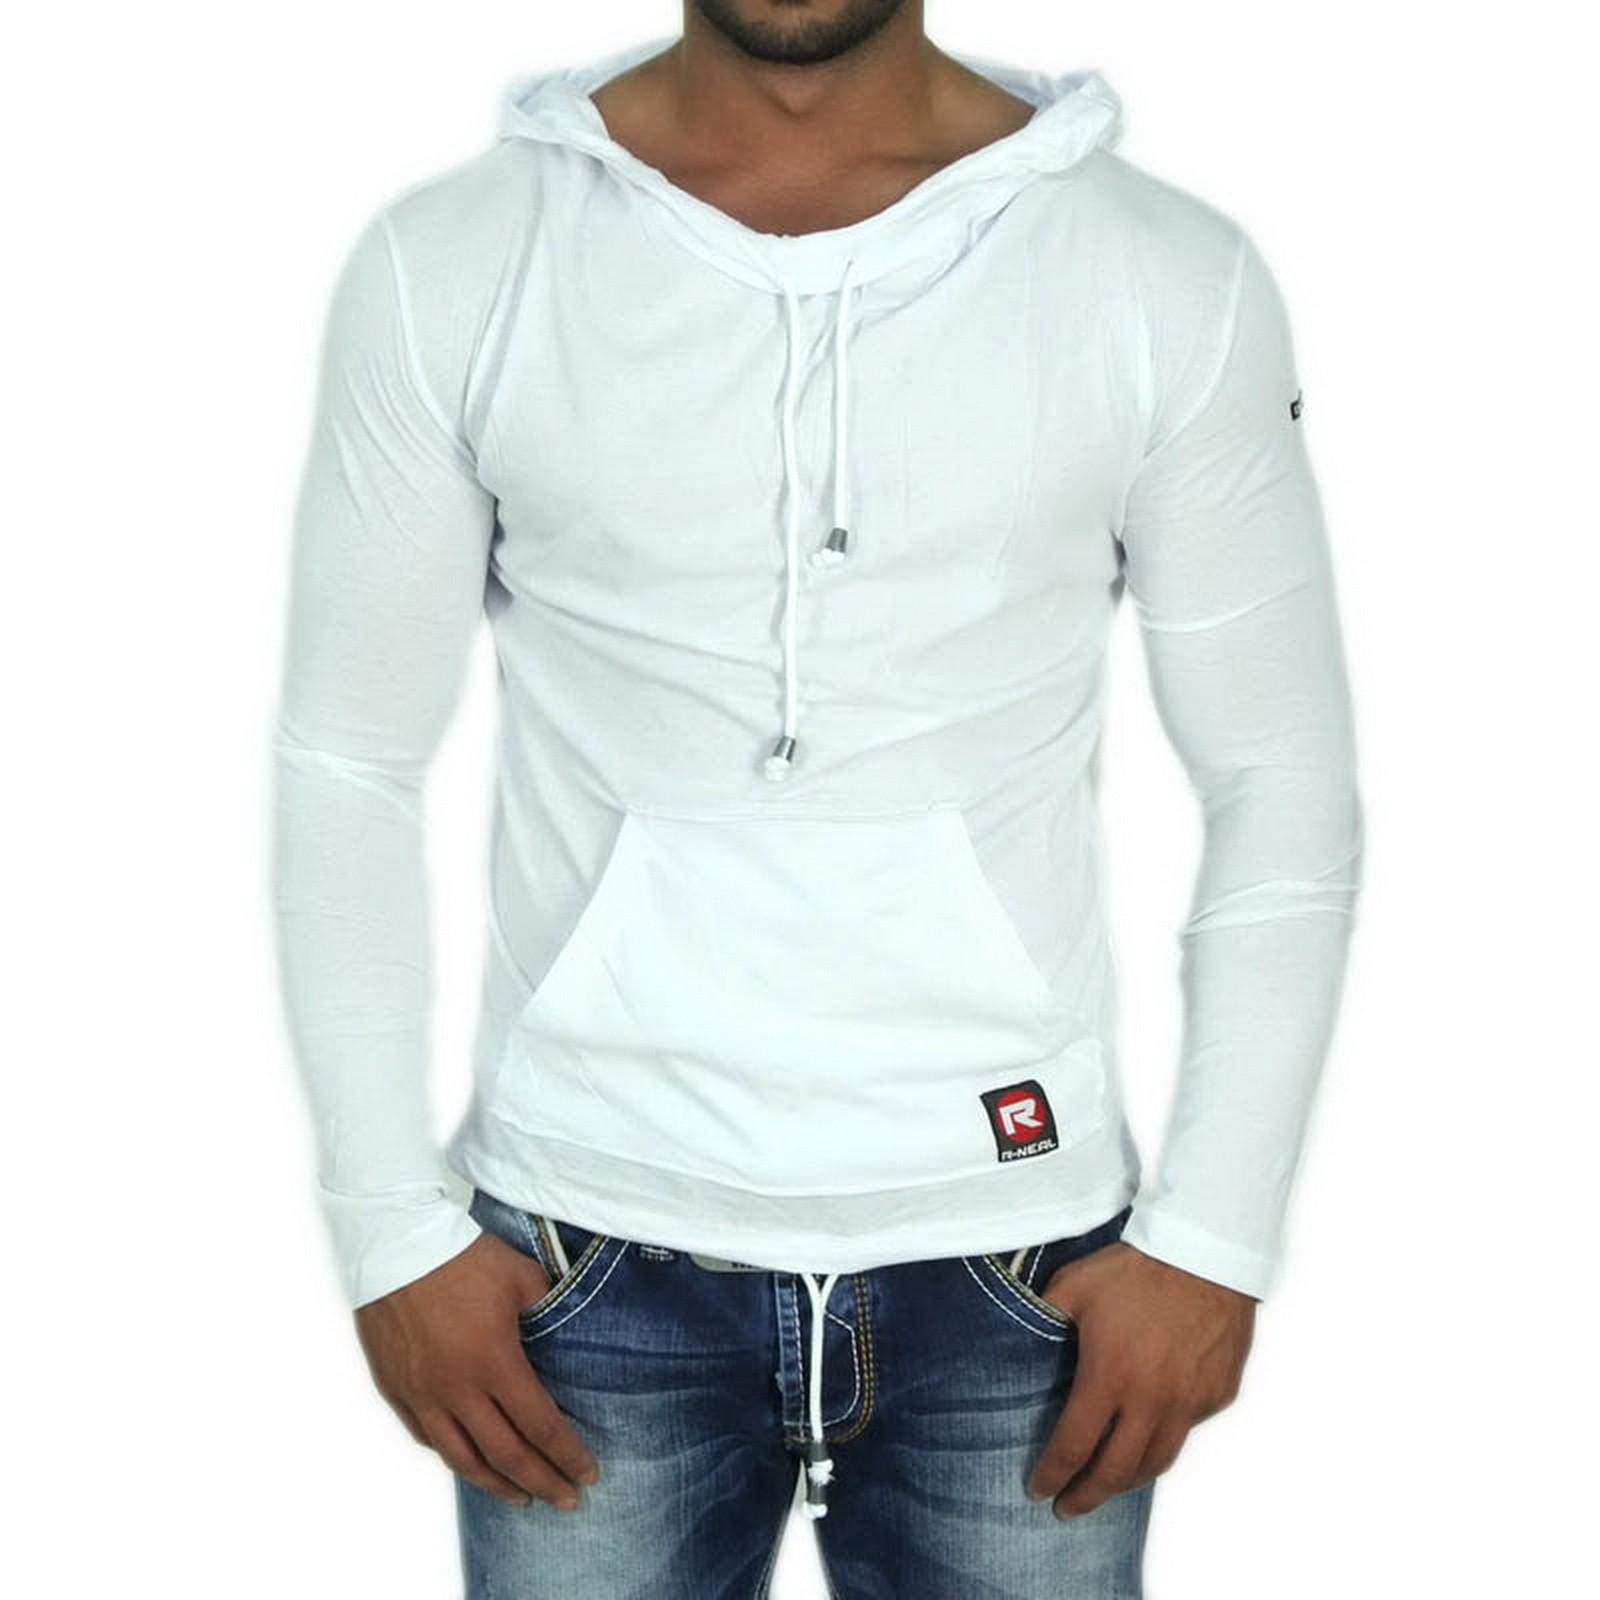 longshirt weiss 6533 r neal herren t shirts langarm. Black Bedroom Furniture Sets. Home Design Ideas